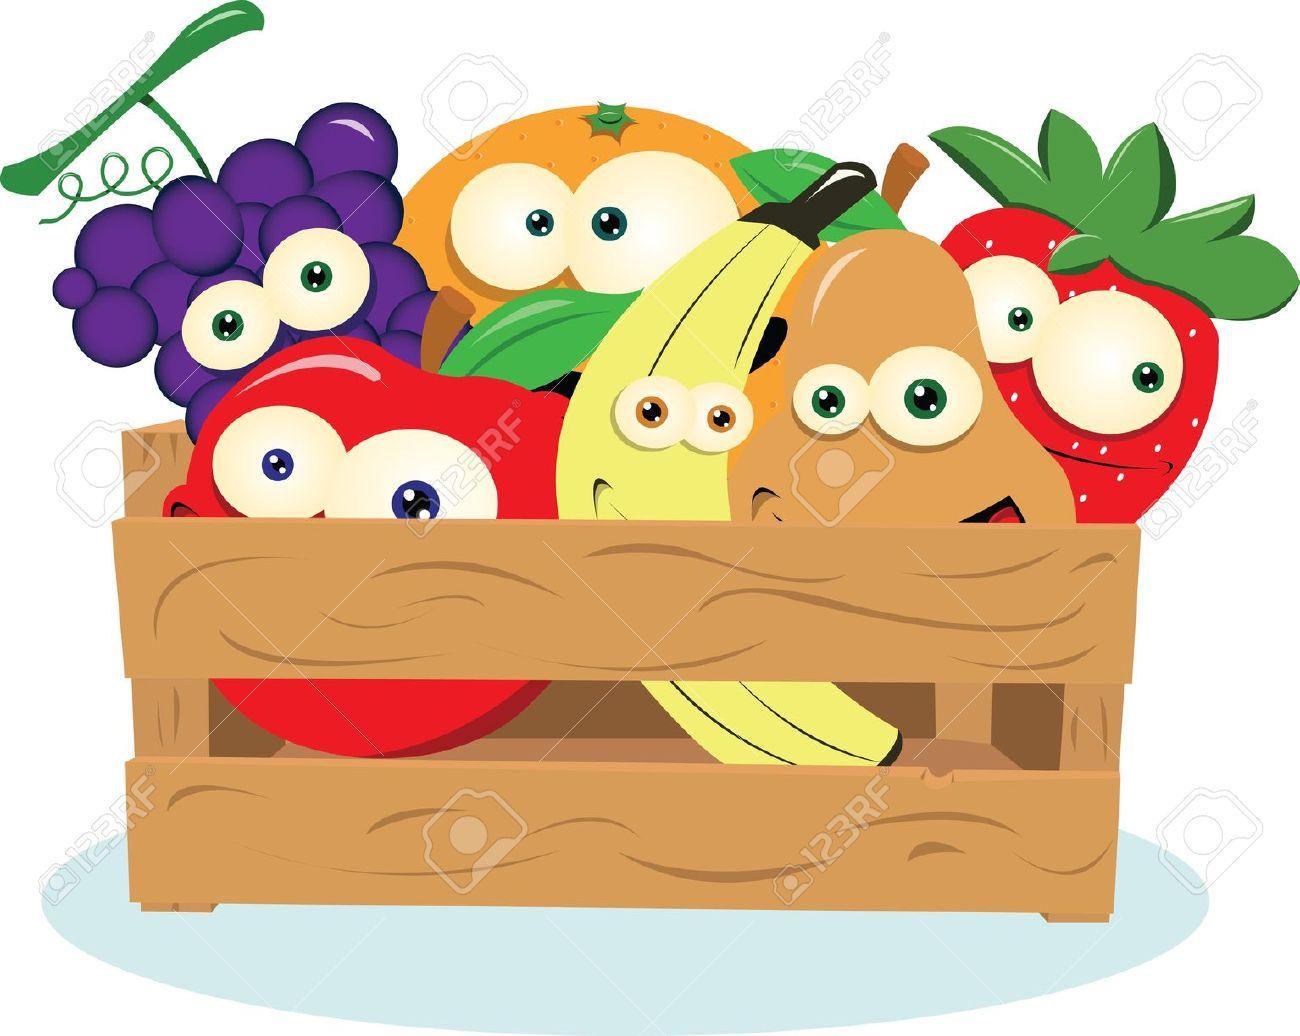 INMACULADA BILINGUE: Las Frutas (the Fruits